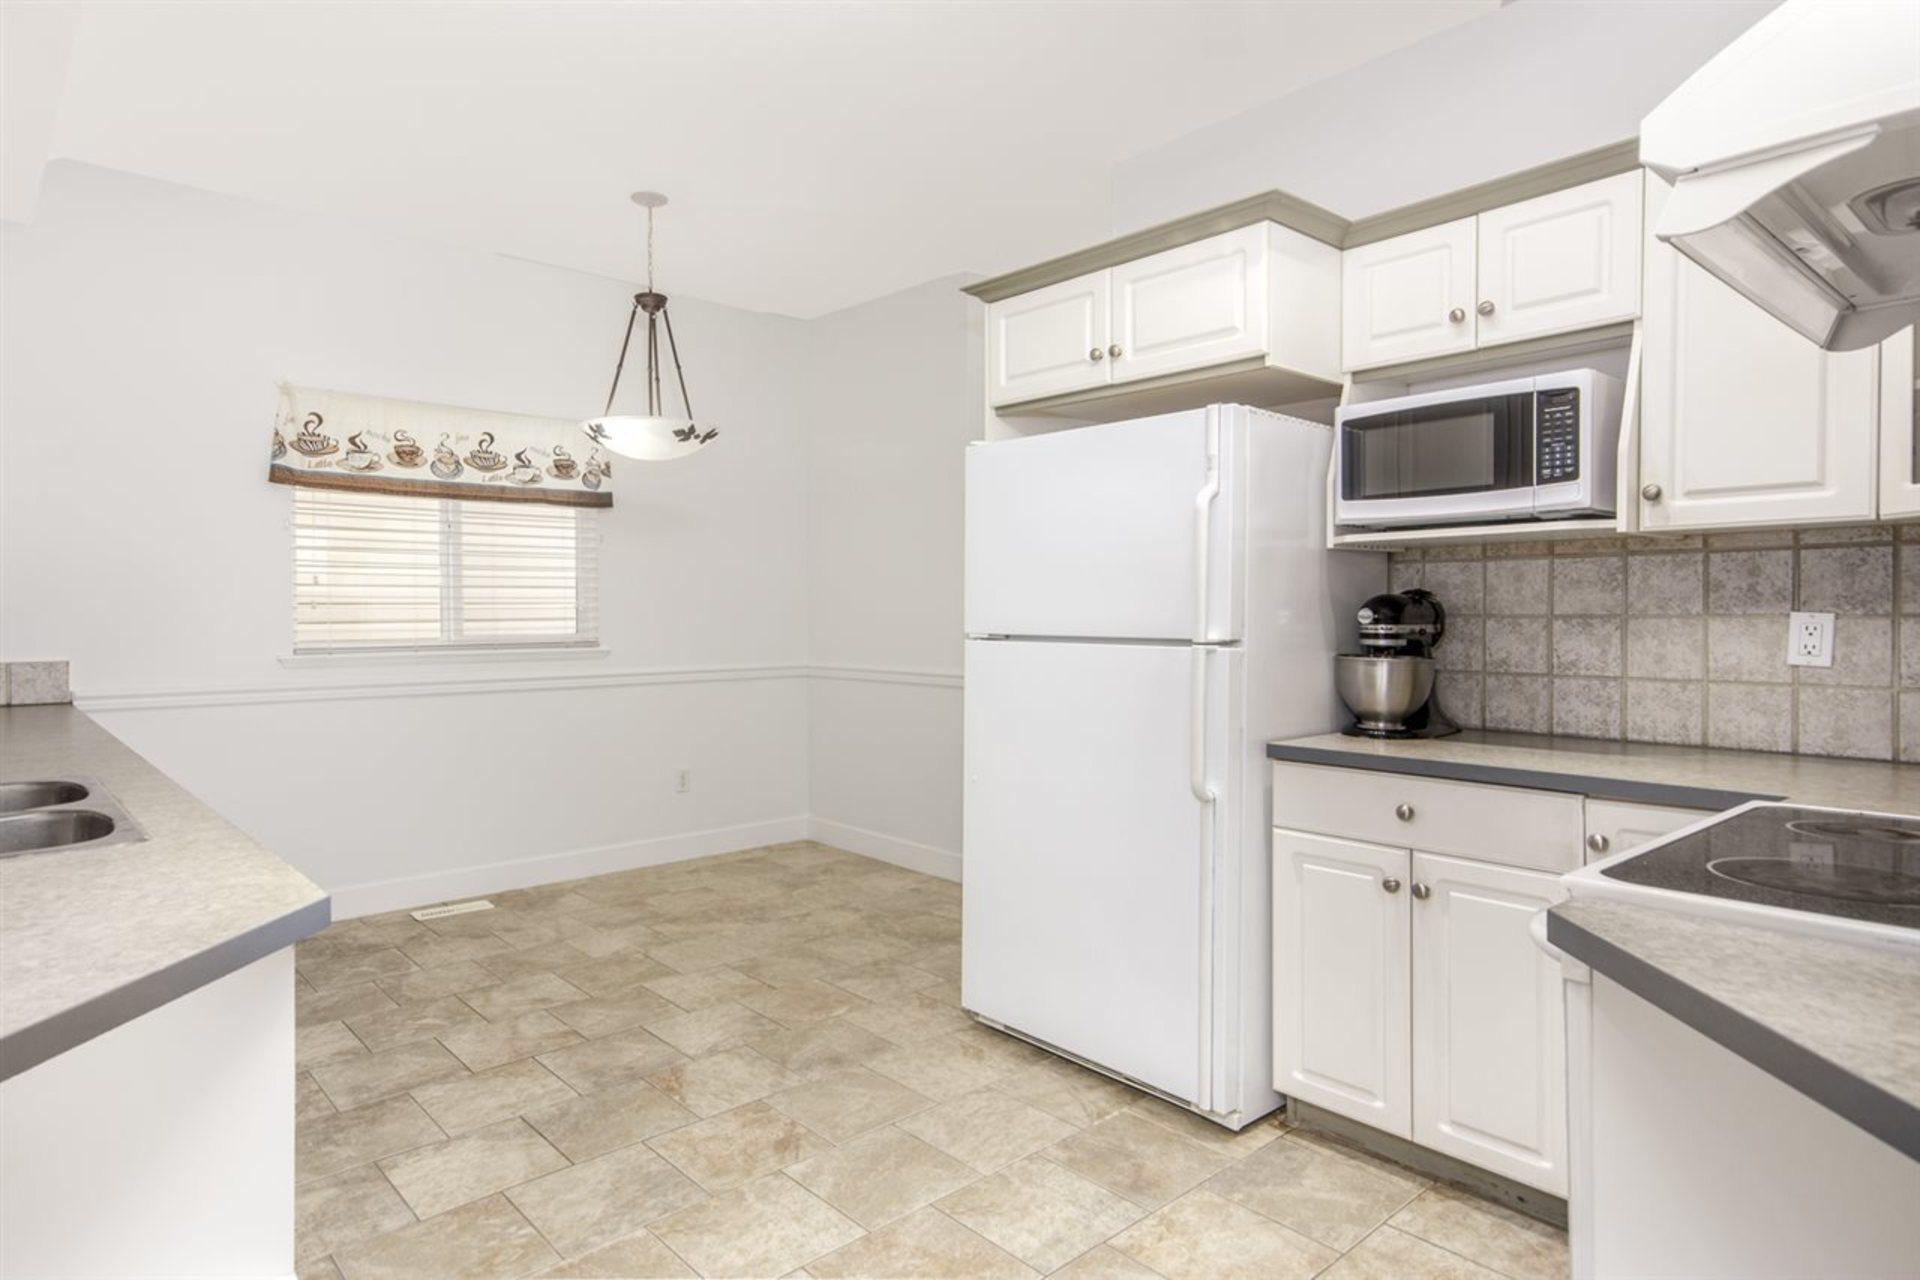 6110-195-street-cloverdale-bc-cloverdale-09 at 6110 195 Street, Cloverdale BC, Cloverdale